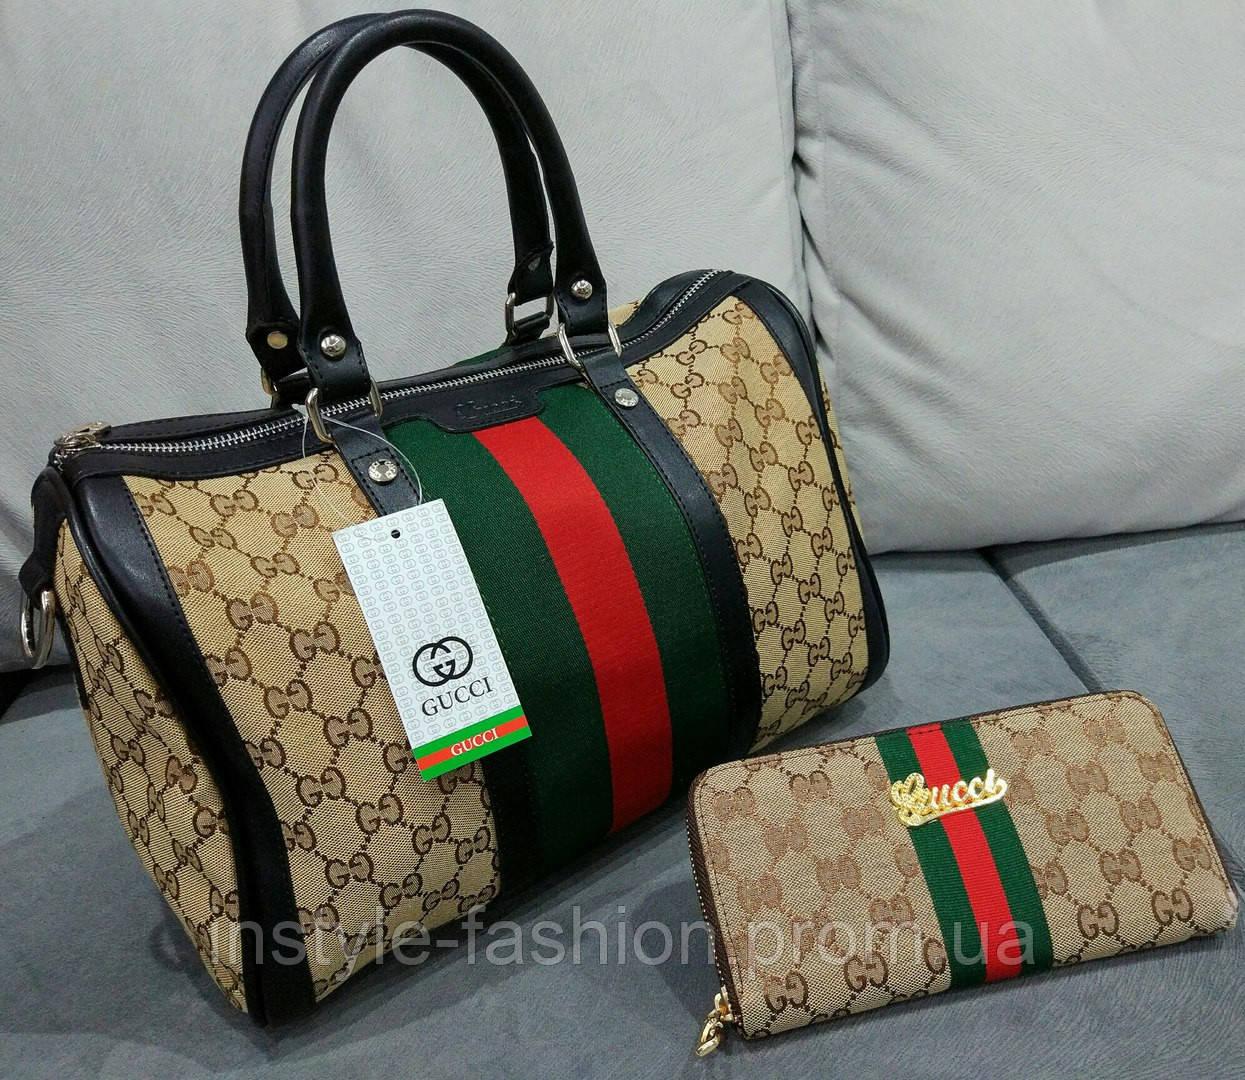 16d84b1218d0 Сумка Gucci Гуччи бочонок: купить недорого копия продажа, цена в ...